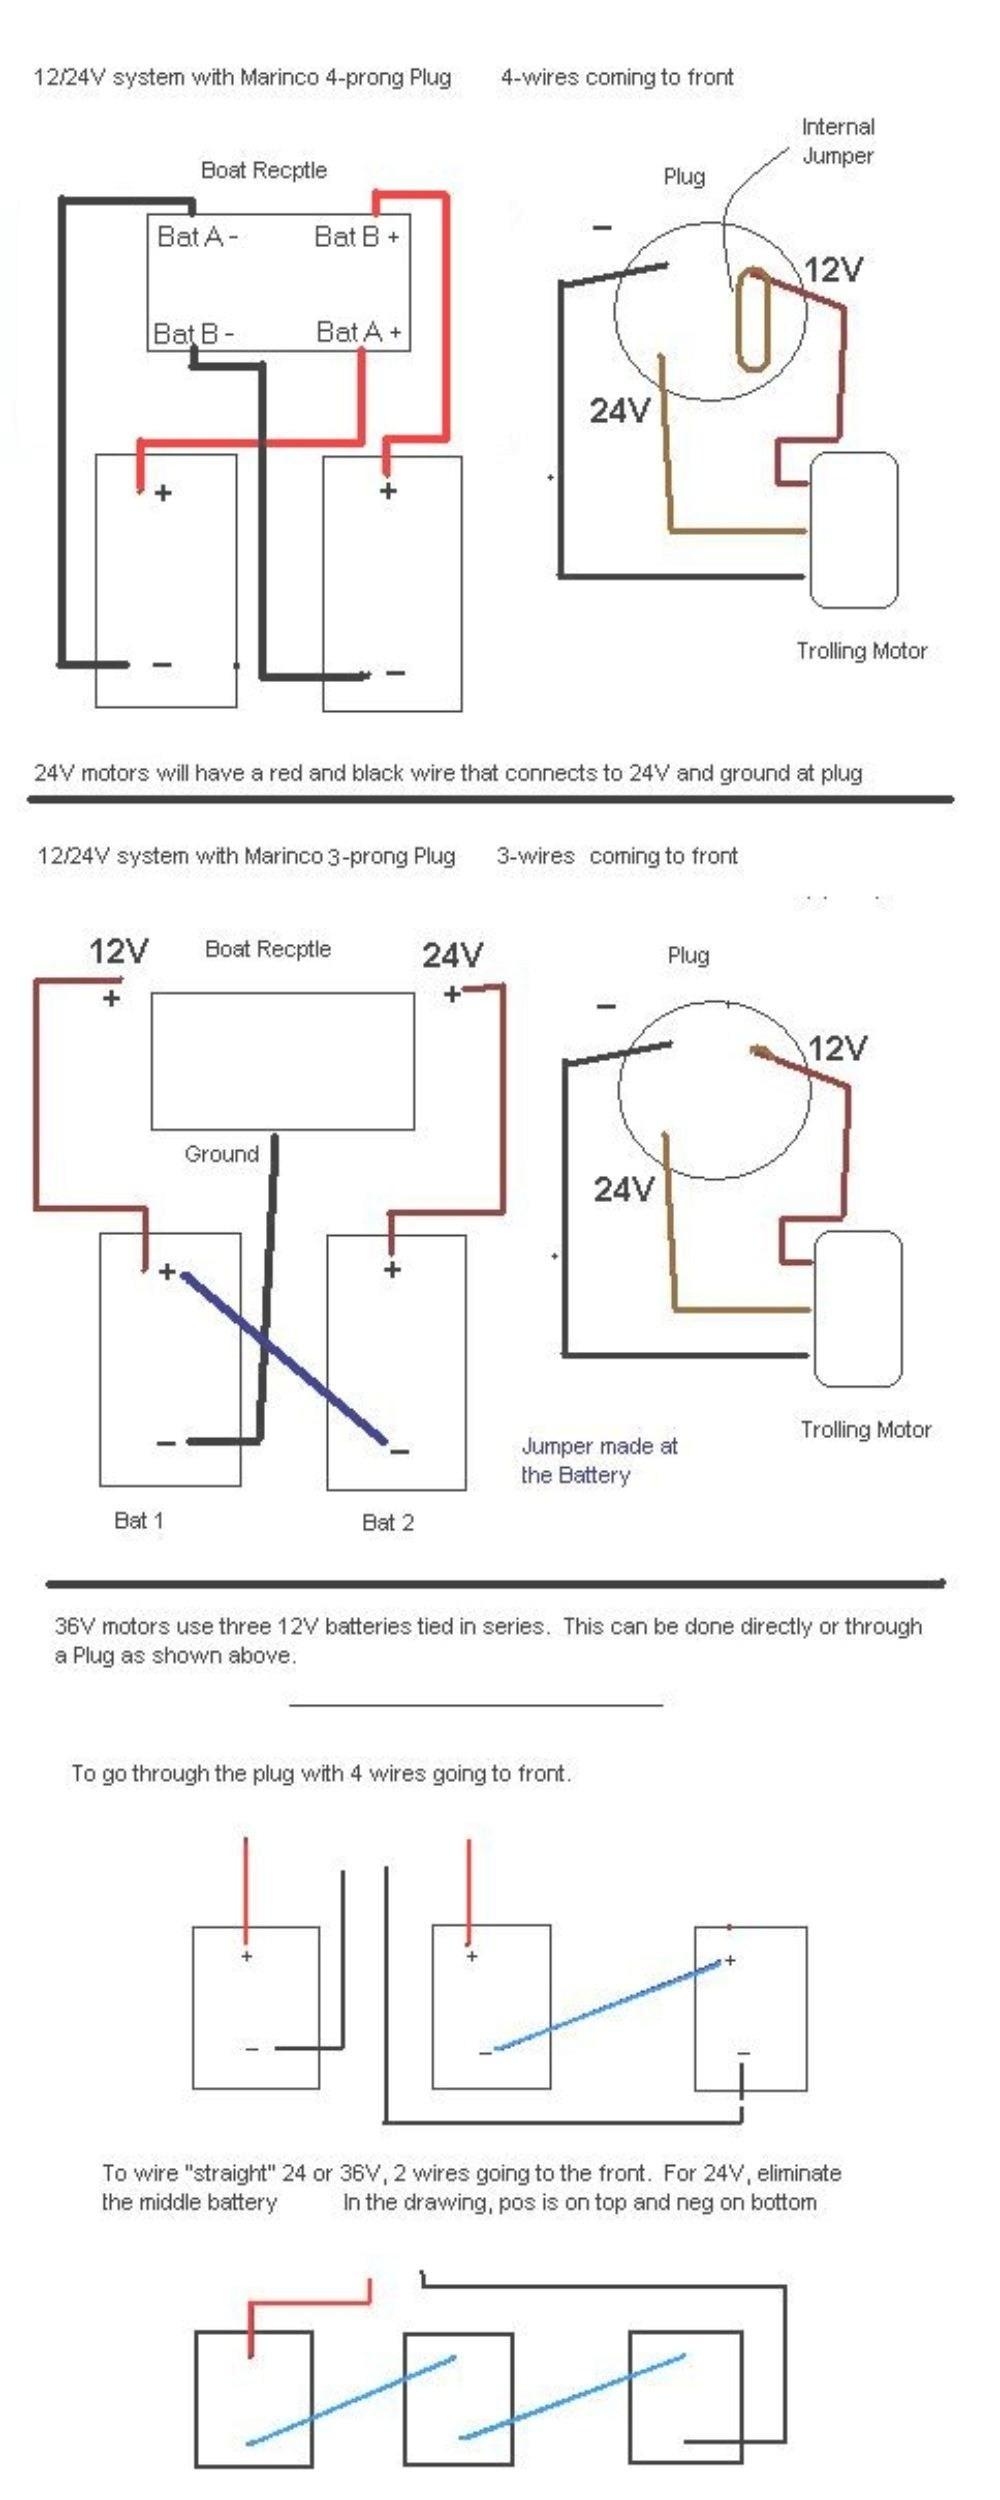 12 24V Trolling Motor Wiring Diagram   Wiring Diagram - Minn Kota Trolling Motor Plug And Receptacle Wiring Diagram